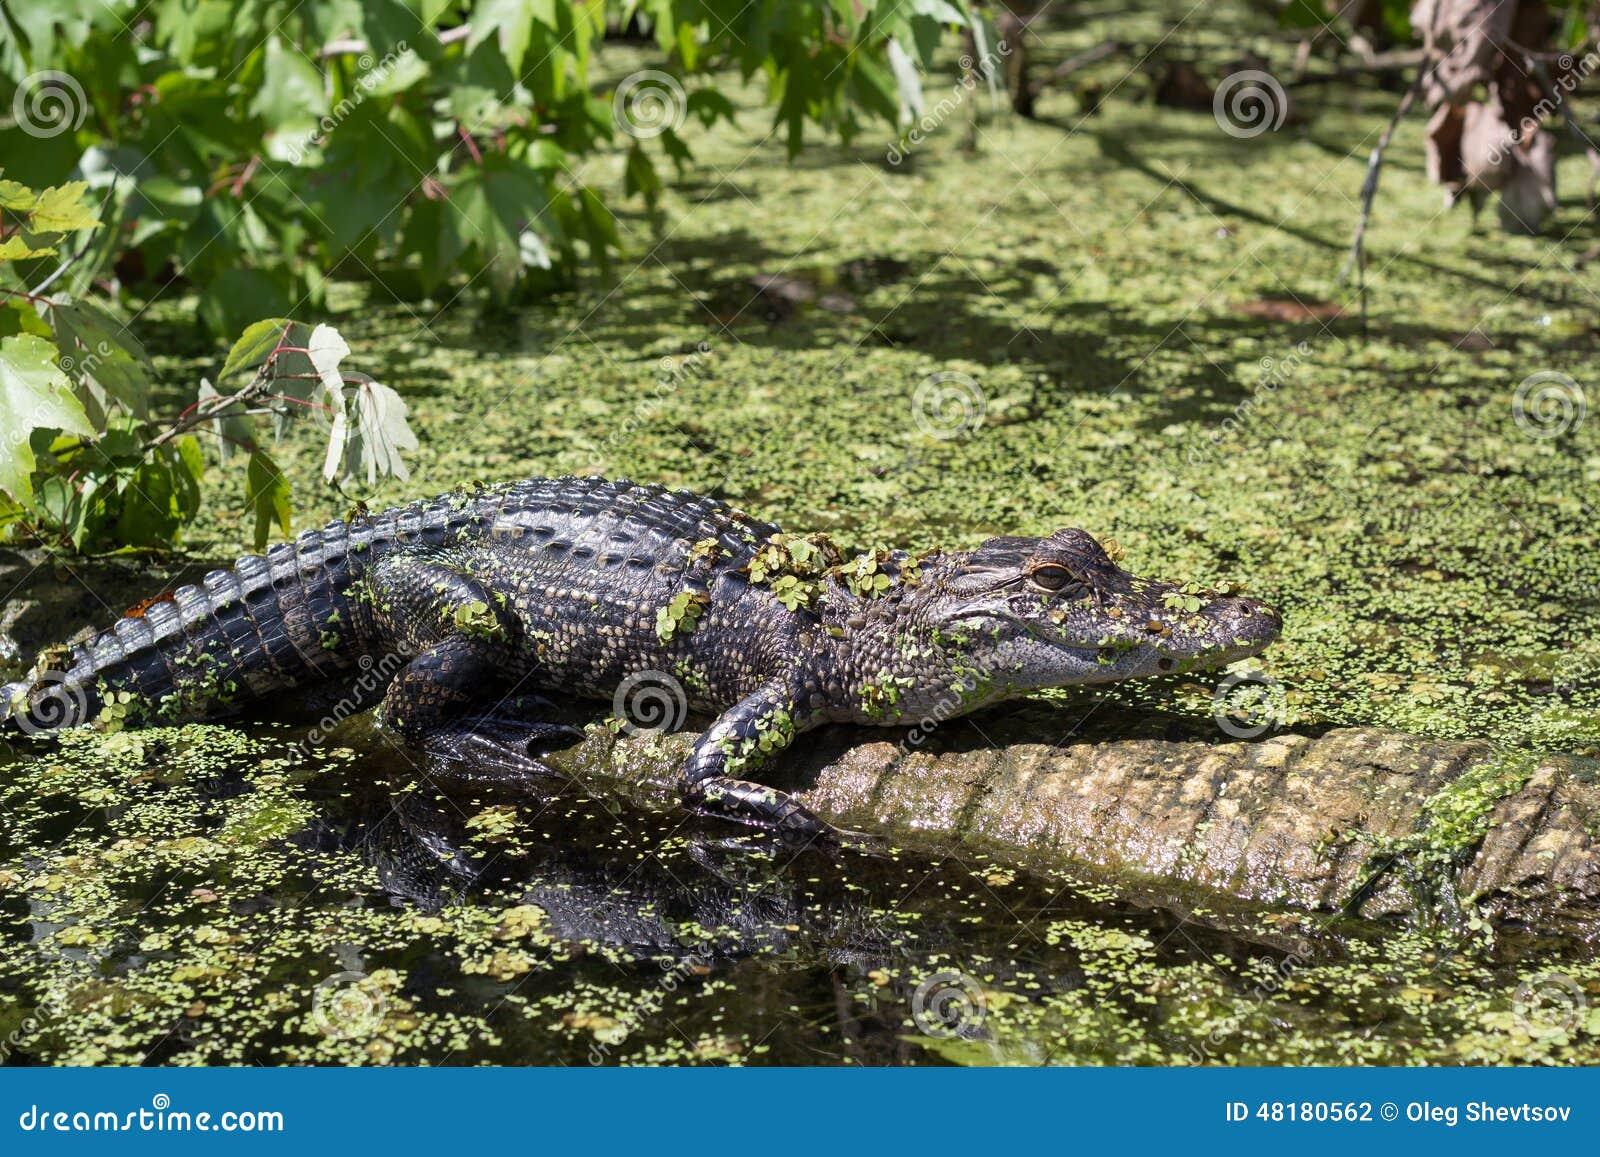 3075f3835396 Crocodile Cayman In The Reserve Stock Photo - Image of swim ...